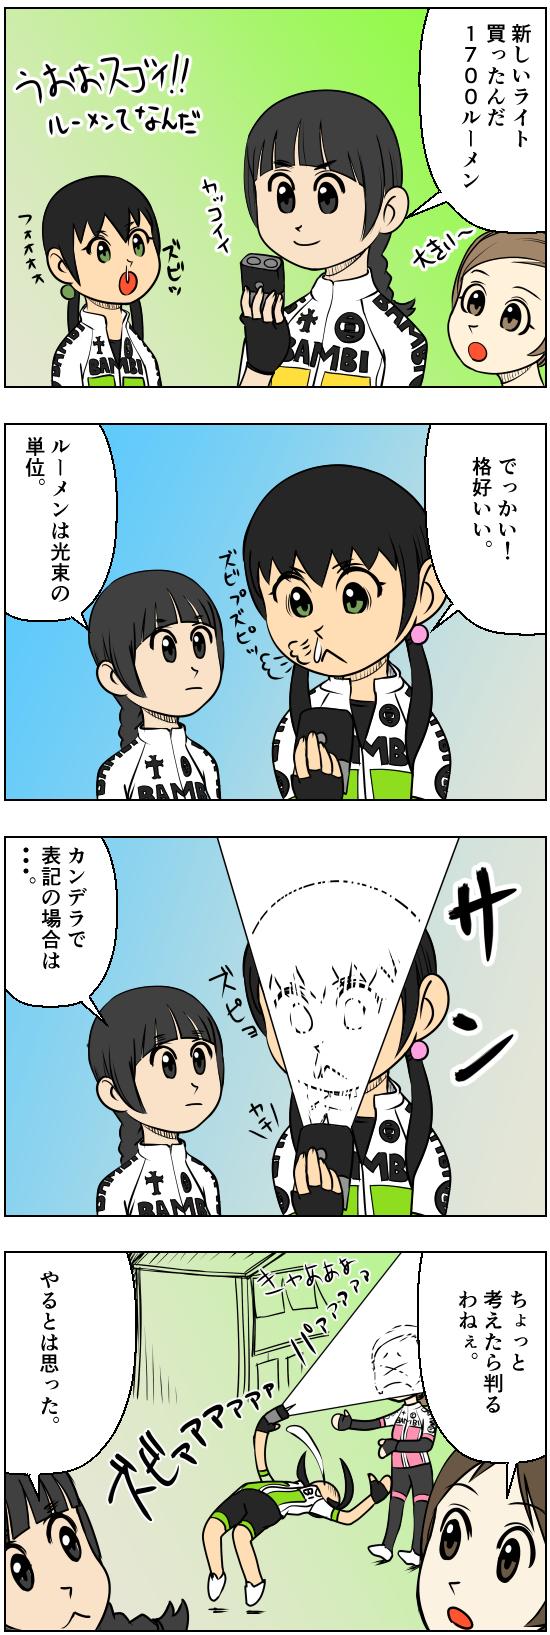 sansyokudanngochan-44-89.jpg